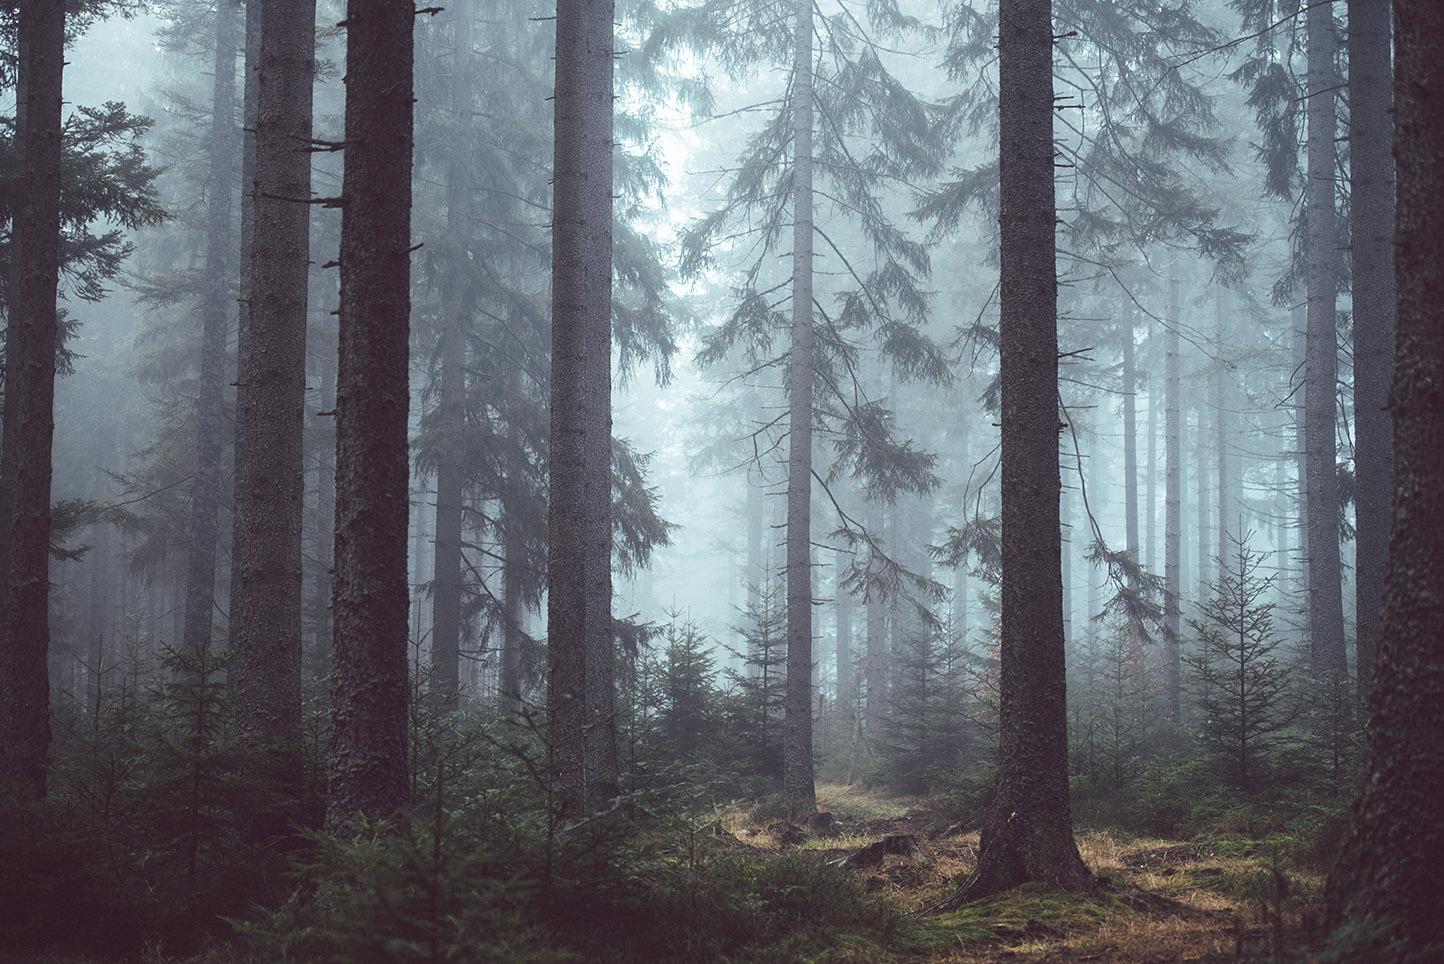 How to Choose a Tree Service Company